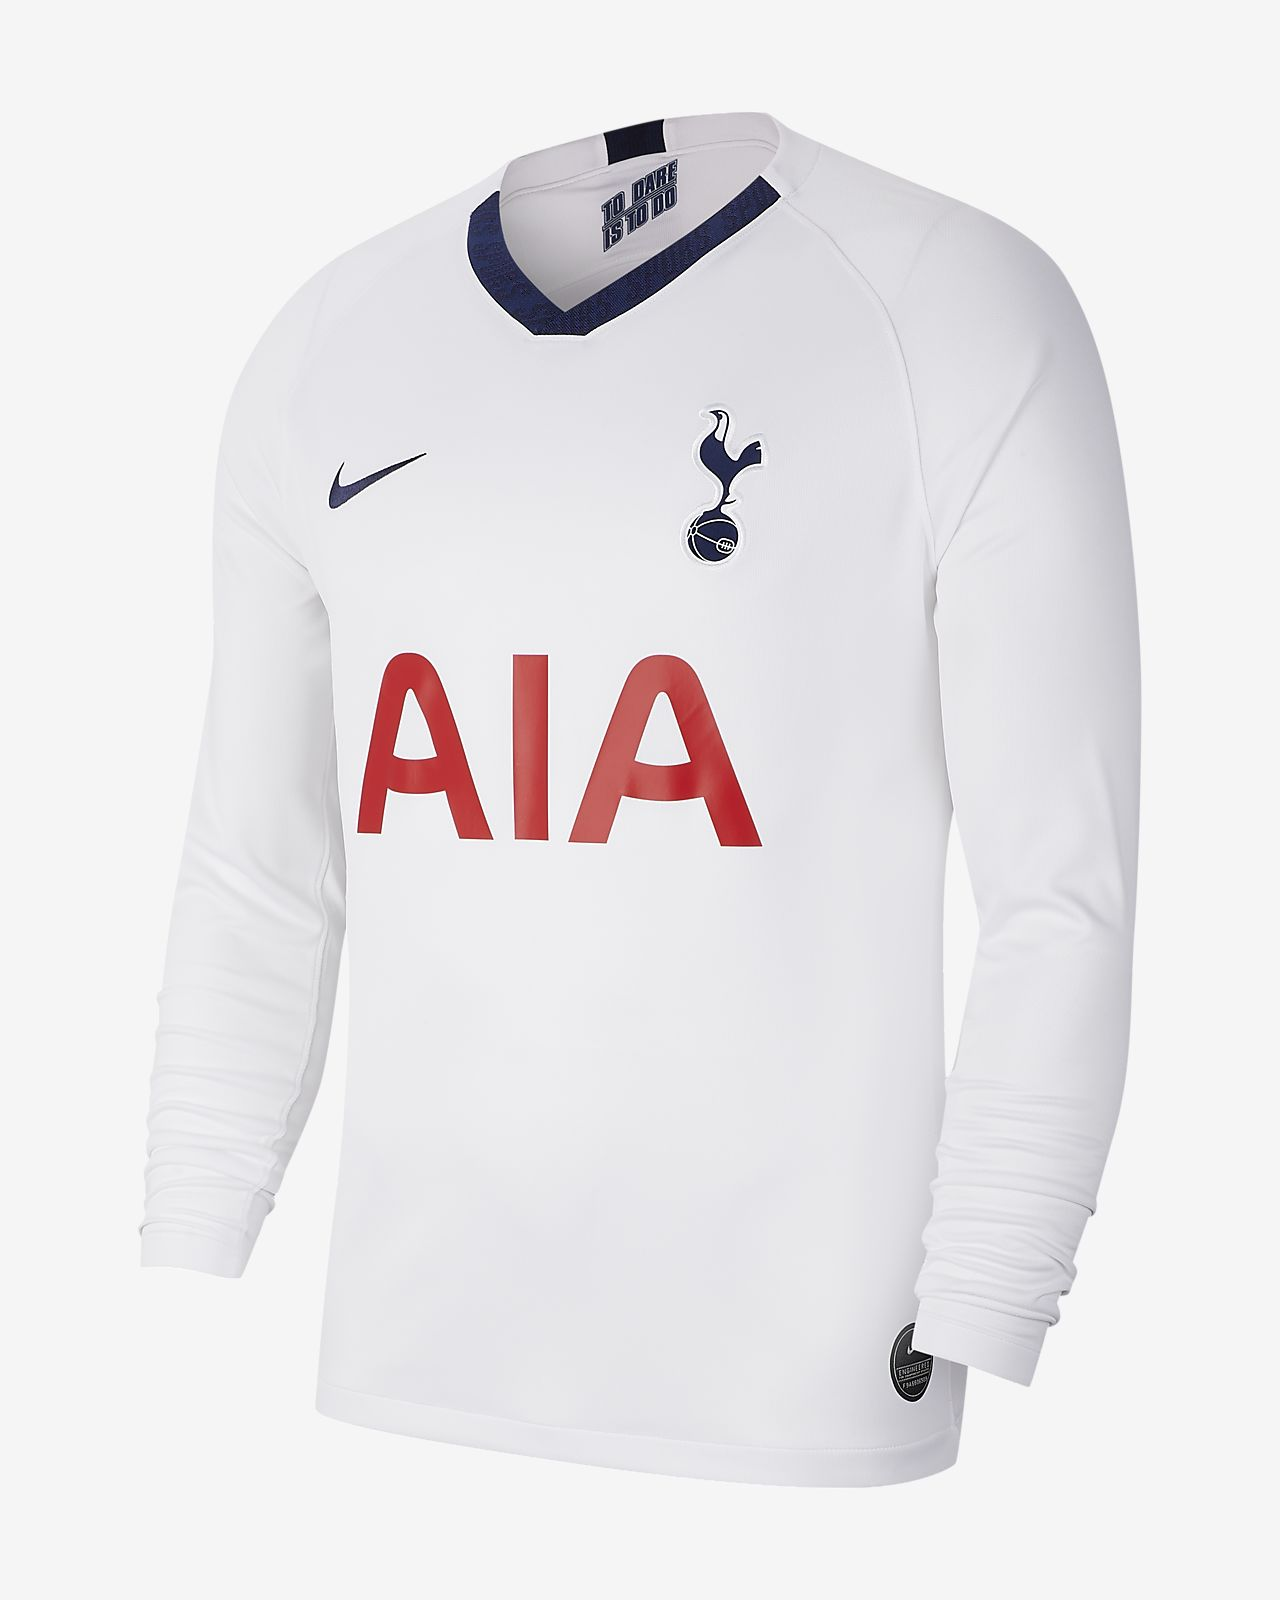 Tottenham Hotspur 2019/20 Stadium Home Uzun Kollu Erkek Futbol Forması